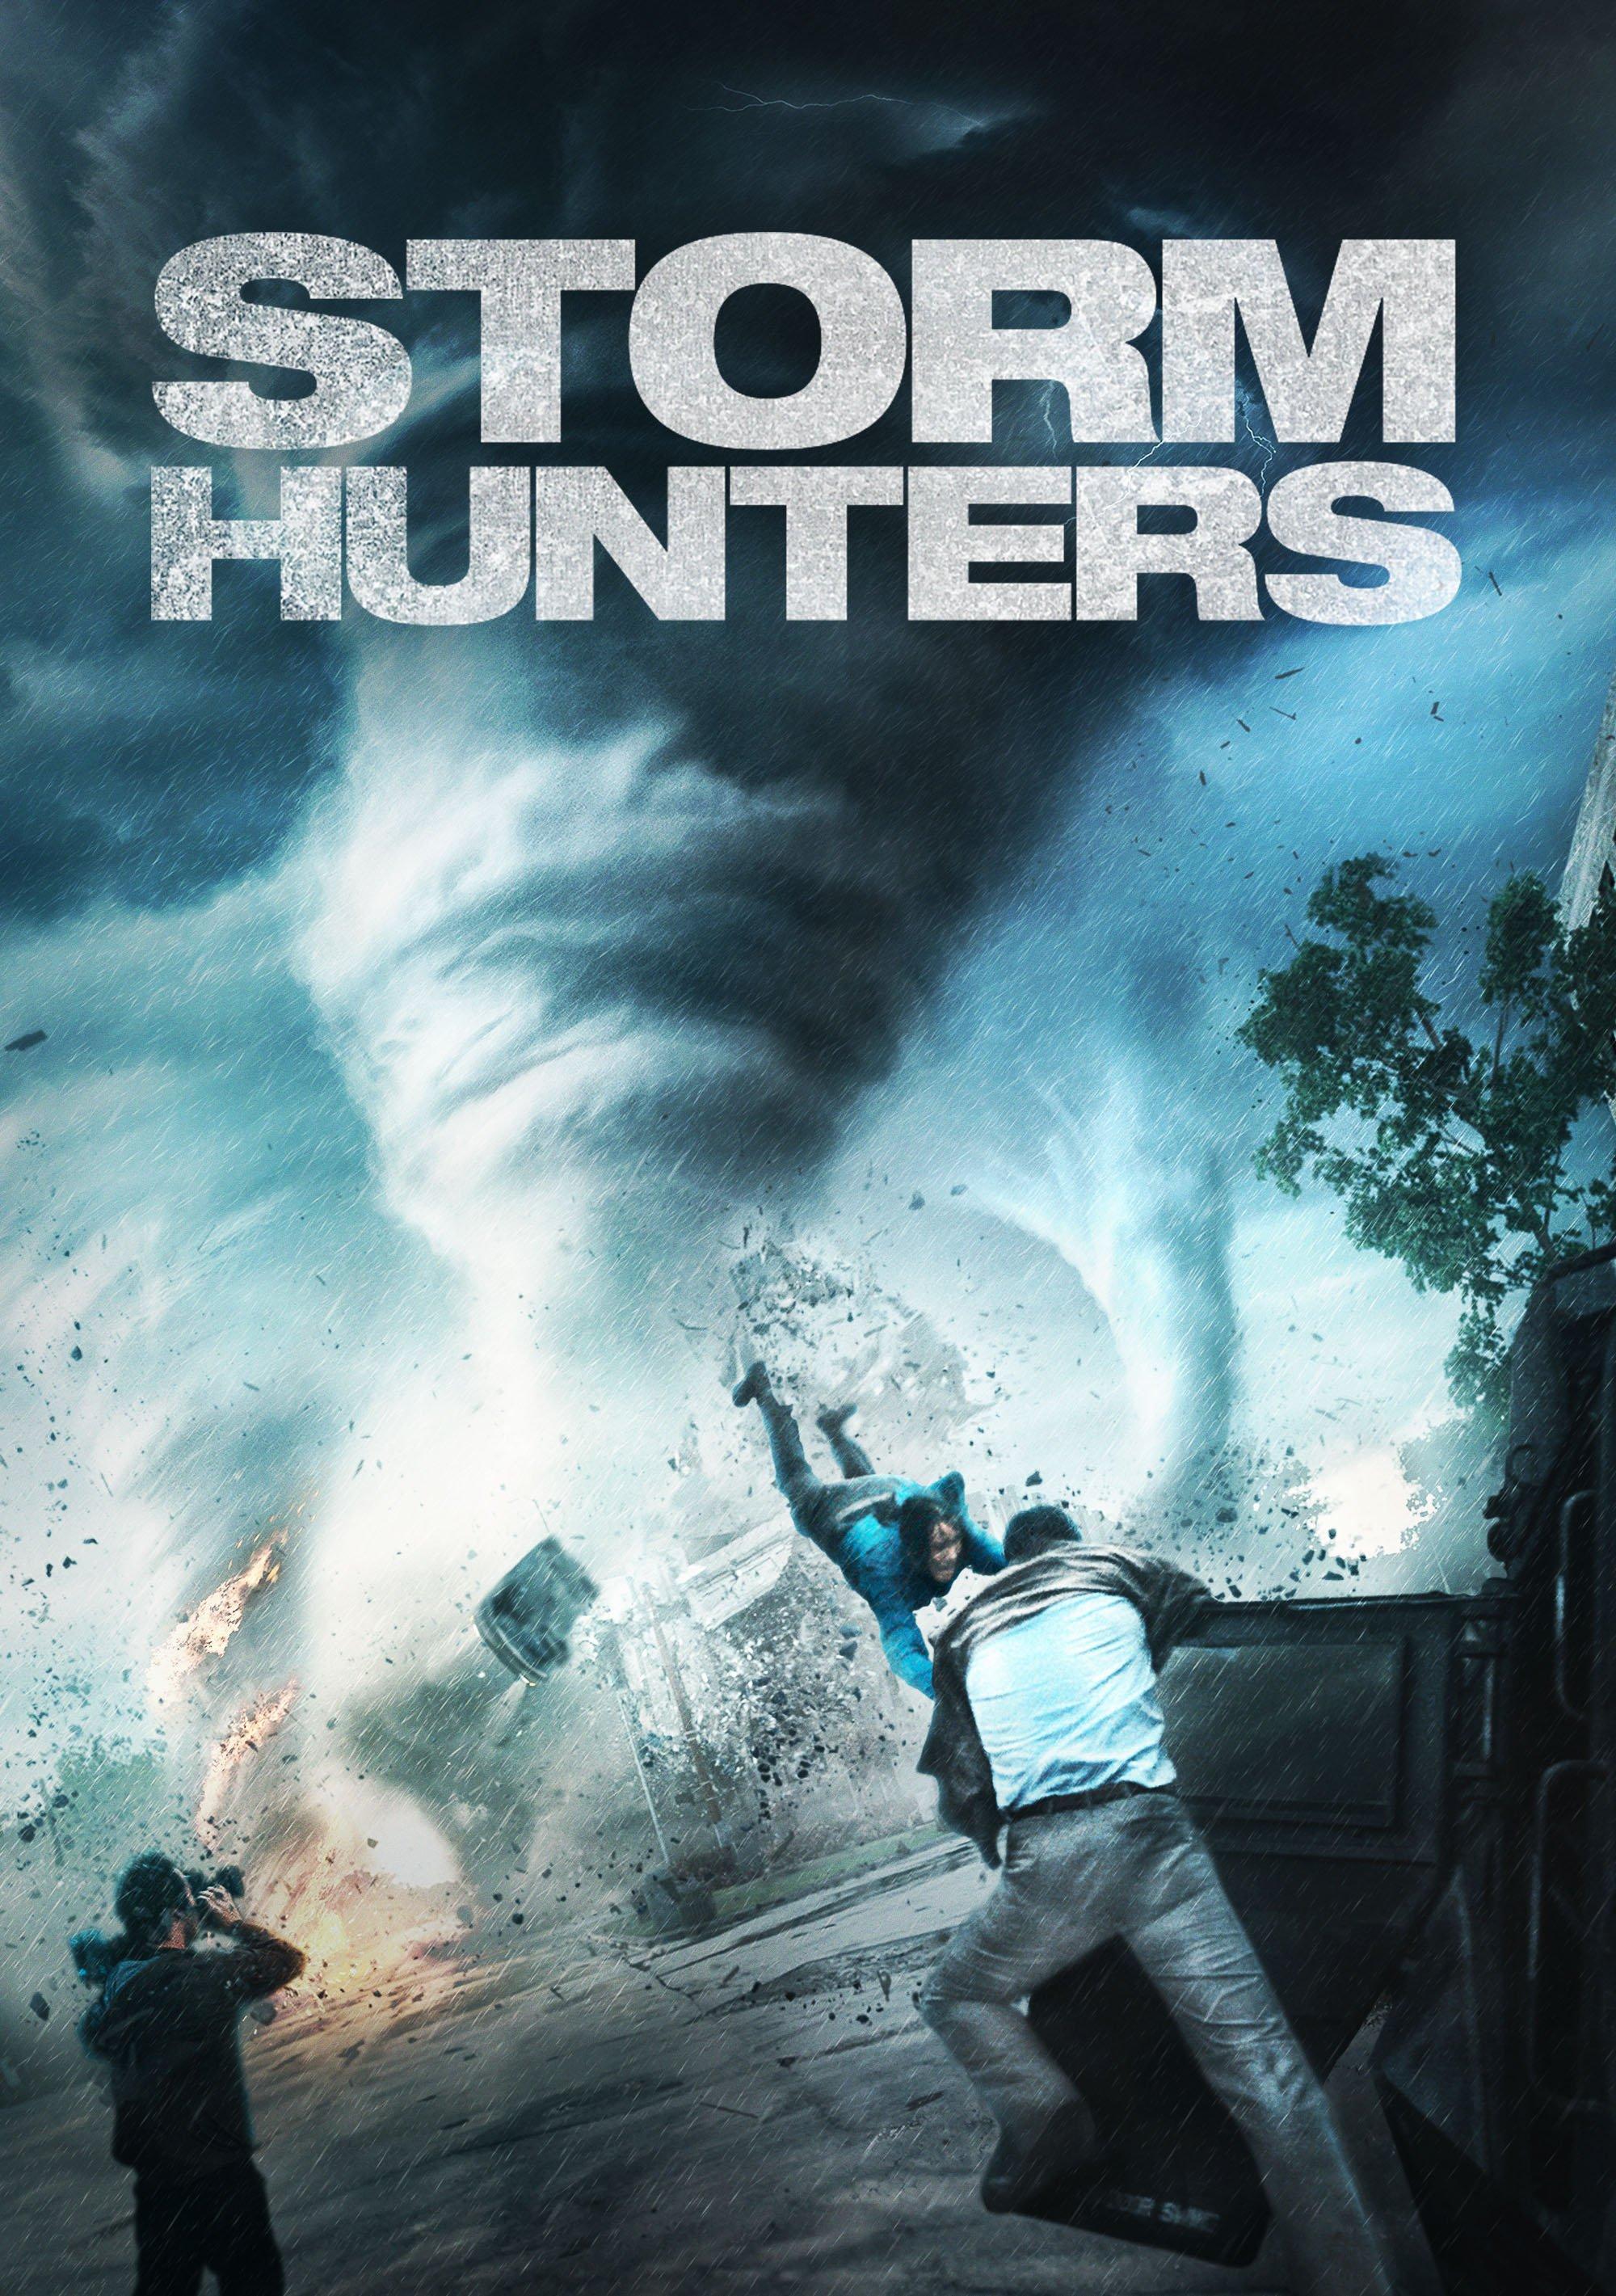 Storm Hunters (2014) stream